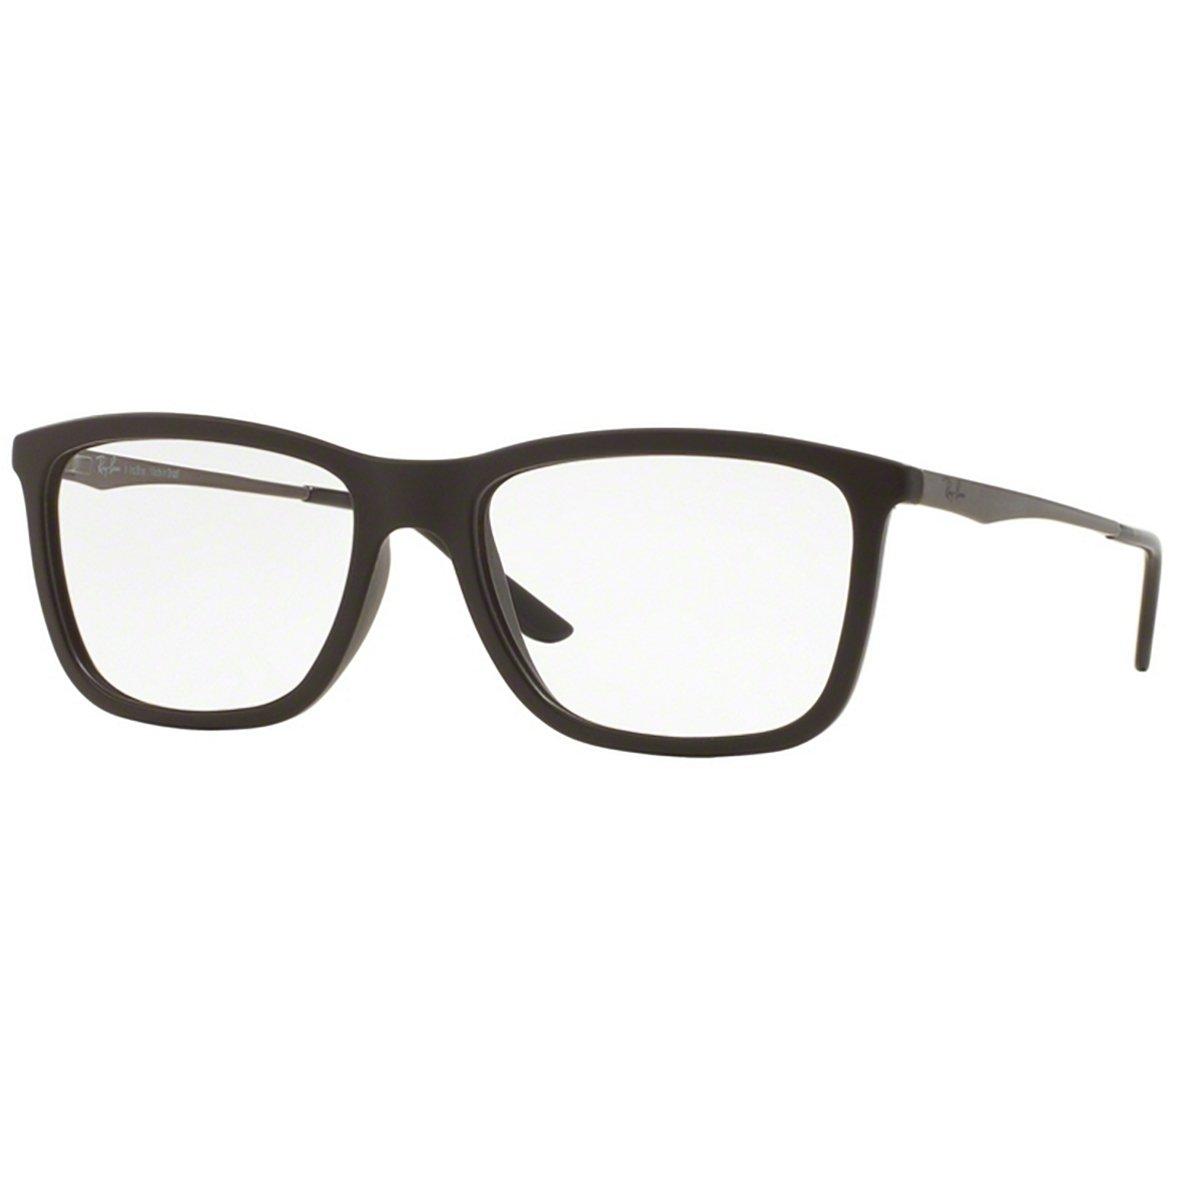 Compre Óculos de Grau Ray Ban em 10X   Tri-Jóia Shop 8d472eb67d